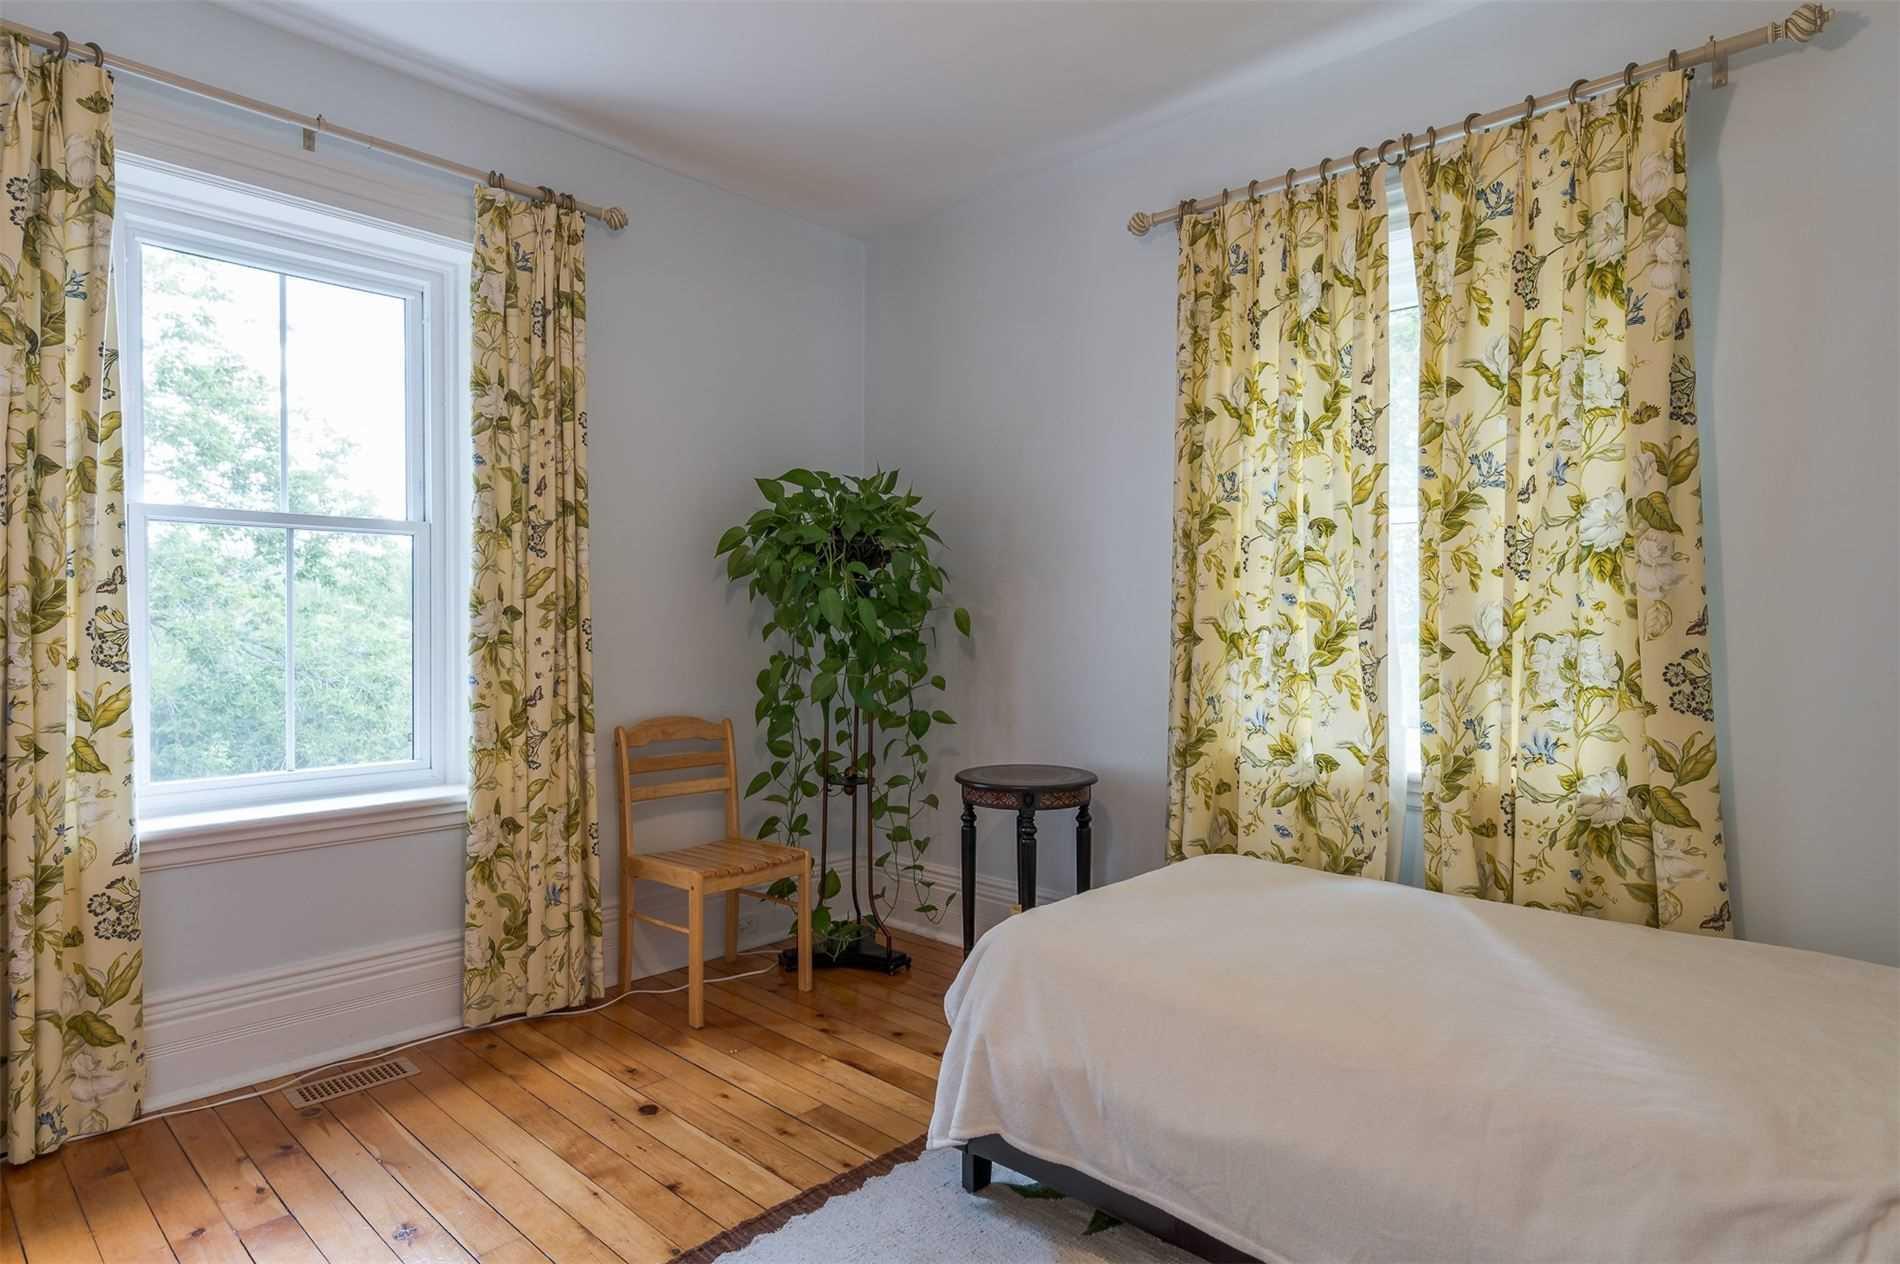 Detached house For Sale In Otonabee-South Monaghan - 879 Highway 7, Otonabee-South Monaghan, Ontario, Canada K9J 6X9 , 4 Bedrooms Bedrooms, ,2 BathroomsBathrooms,Detached,For Sale,Highway 7